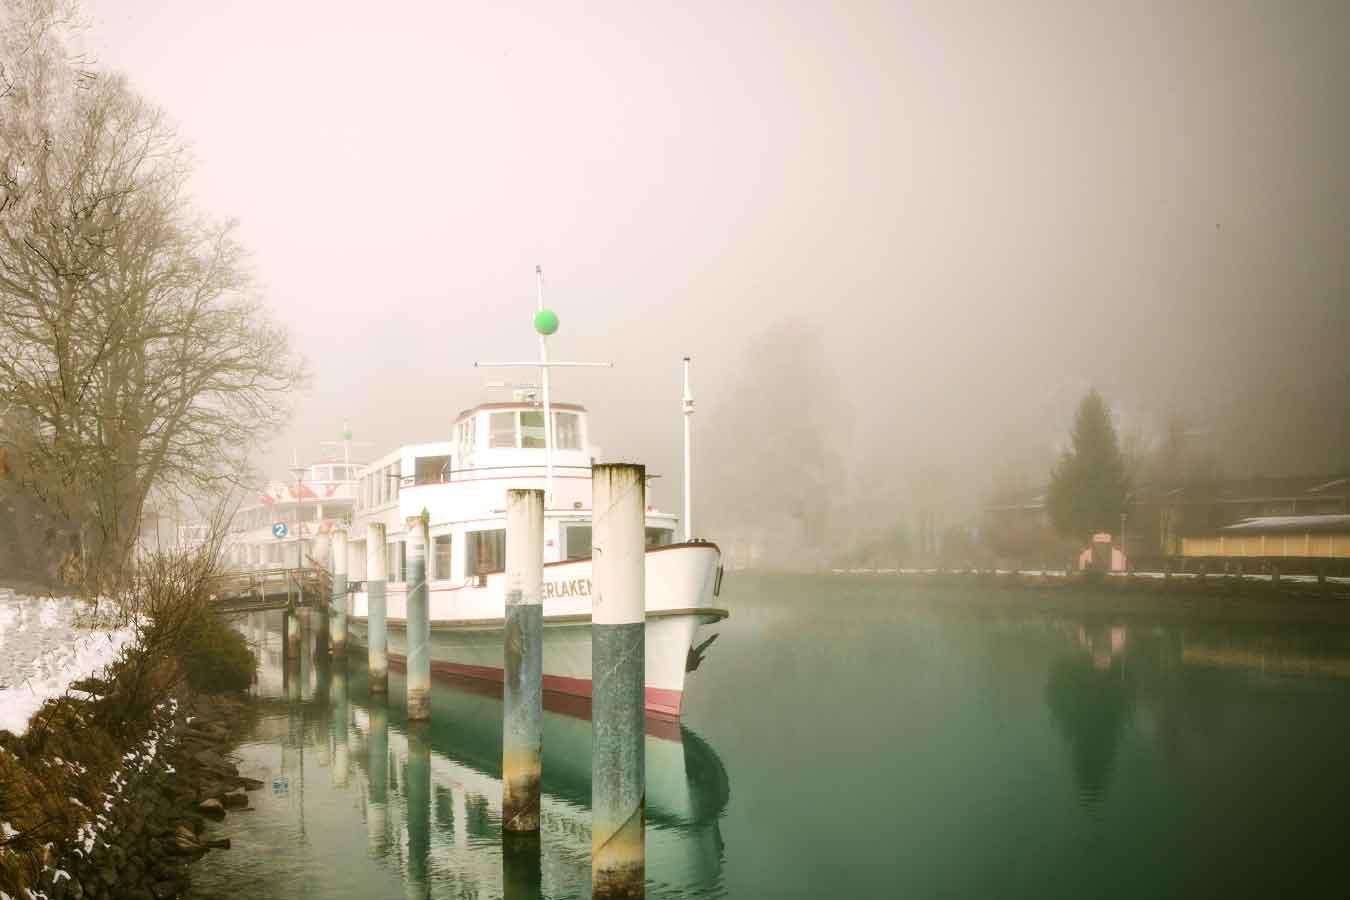 Interlaken photo tours